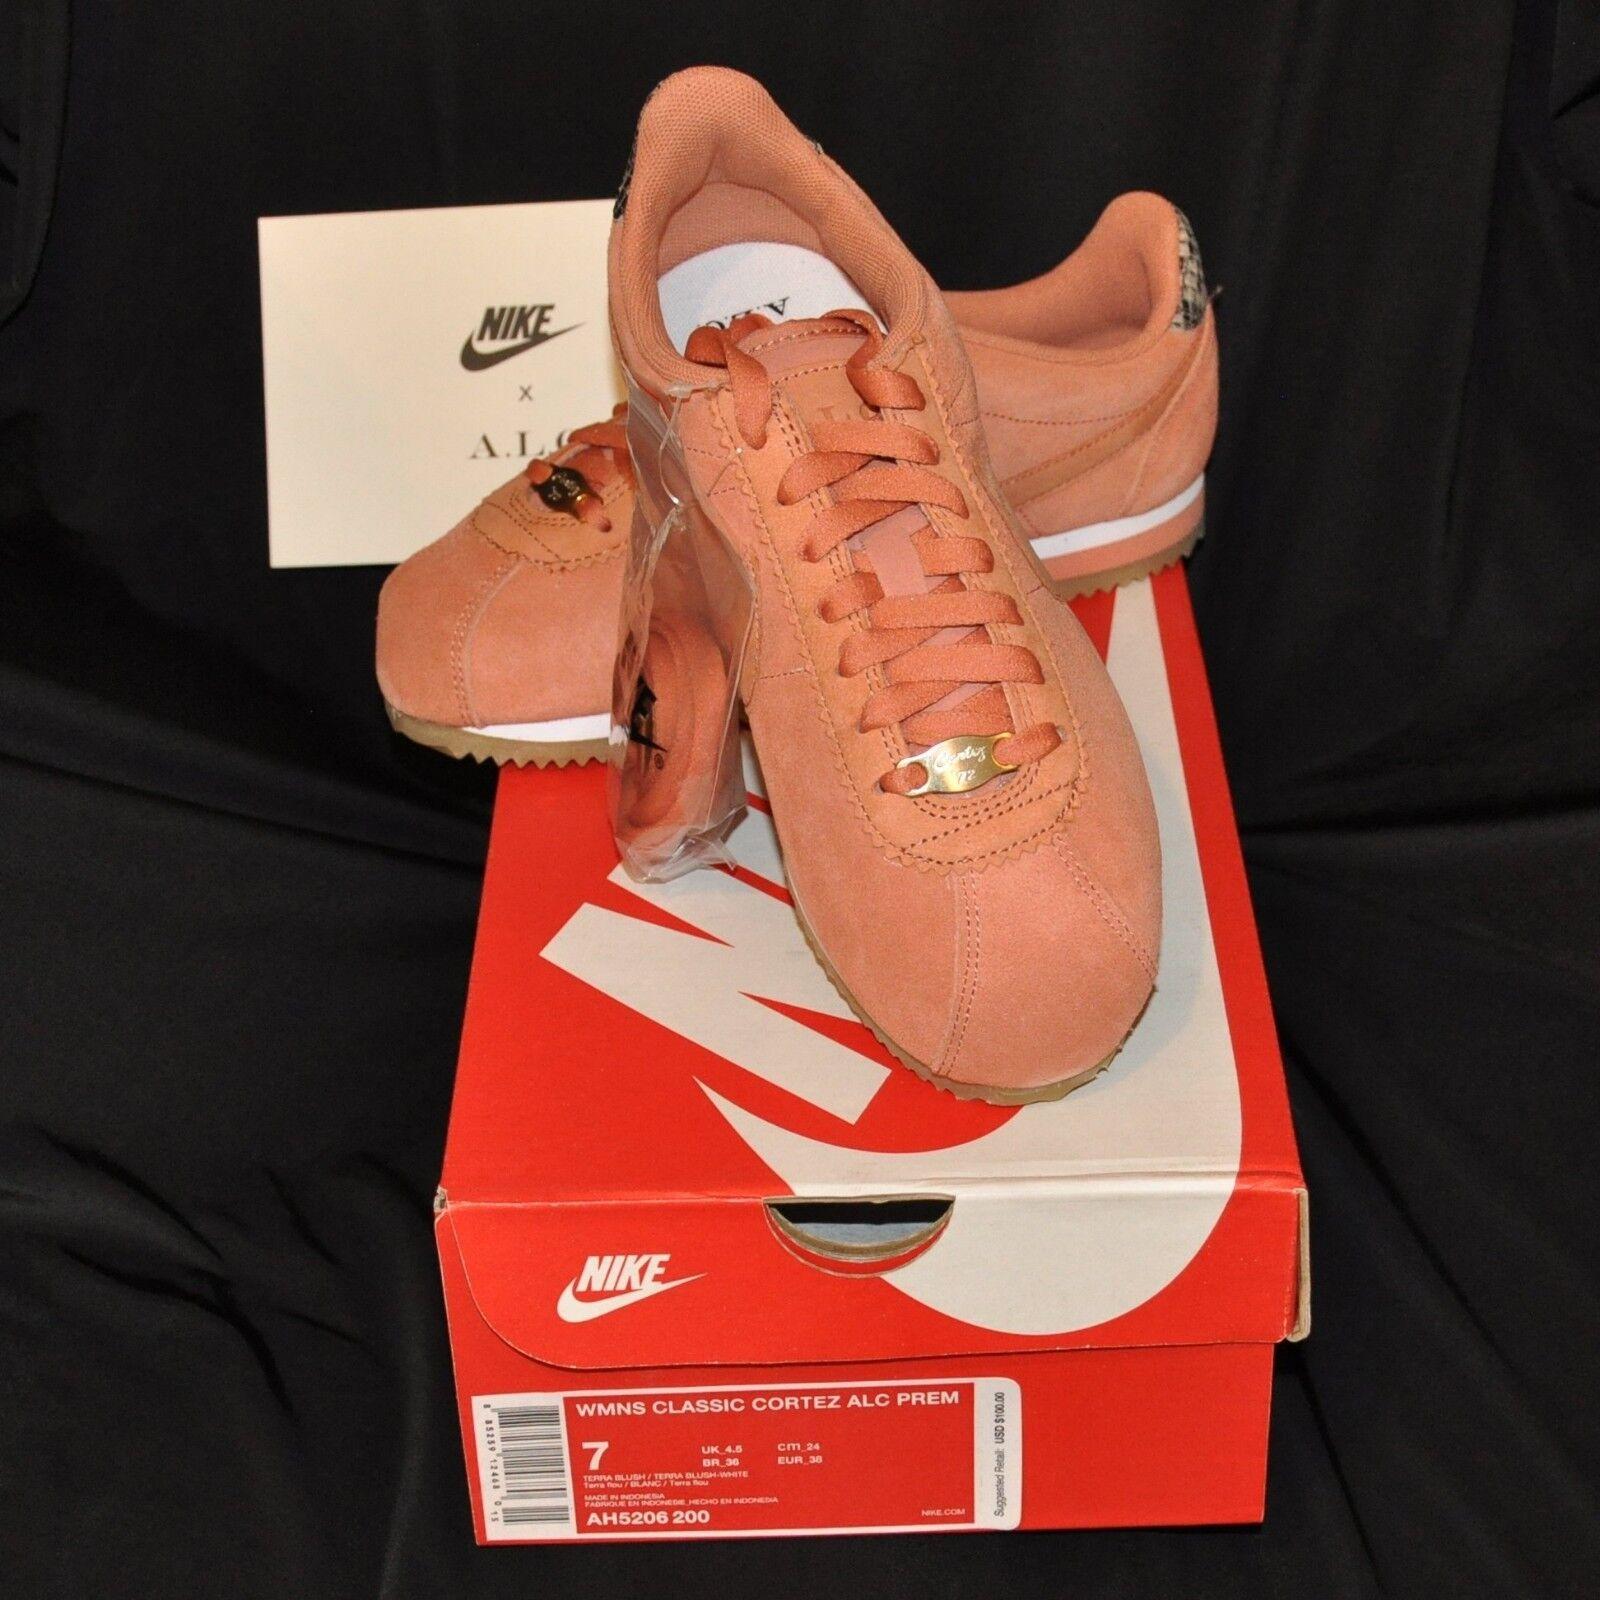 NIB Nike Womens Classic Cortex Premium Size 7 Terra Blush Andrea Liberman HipHop